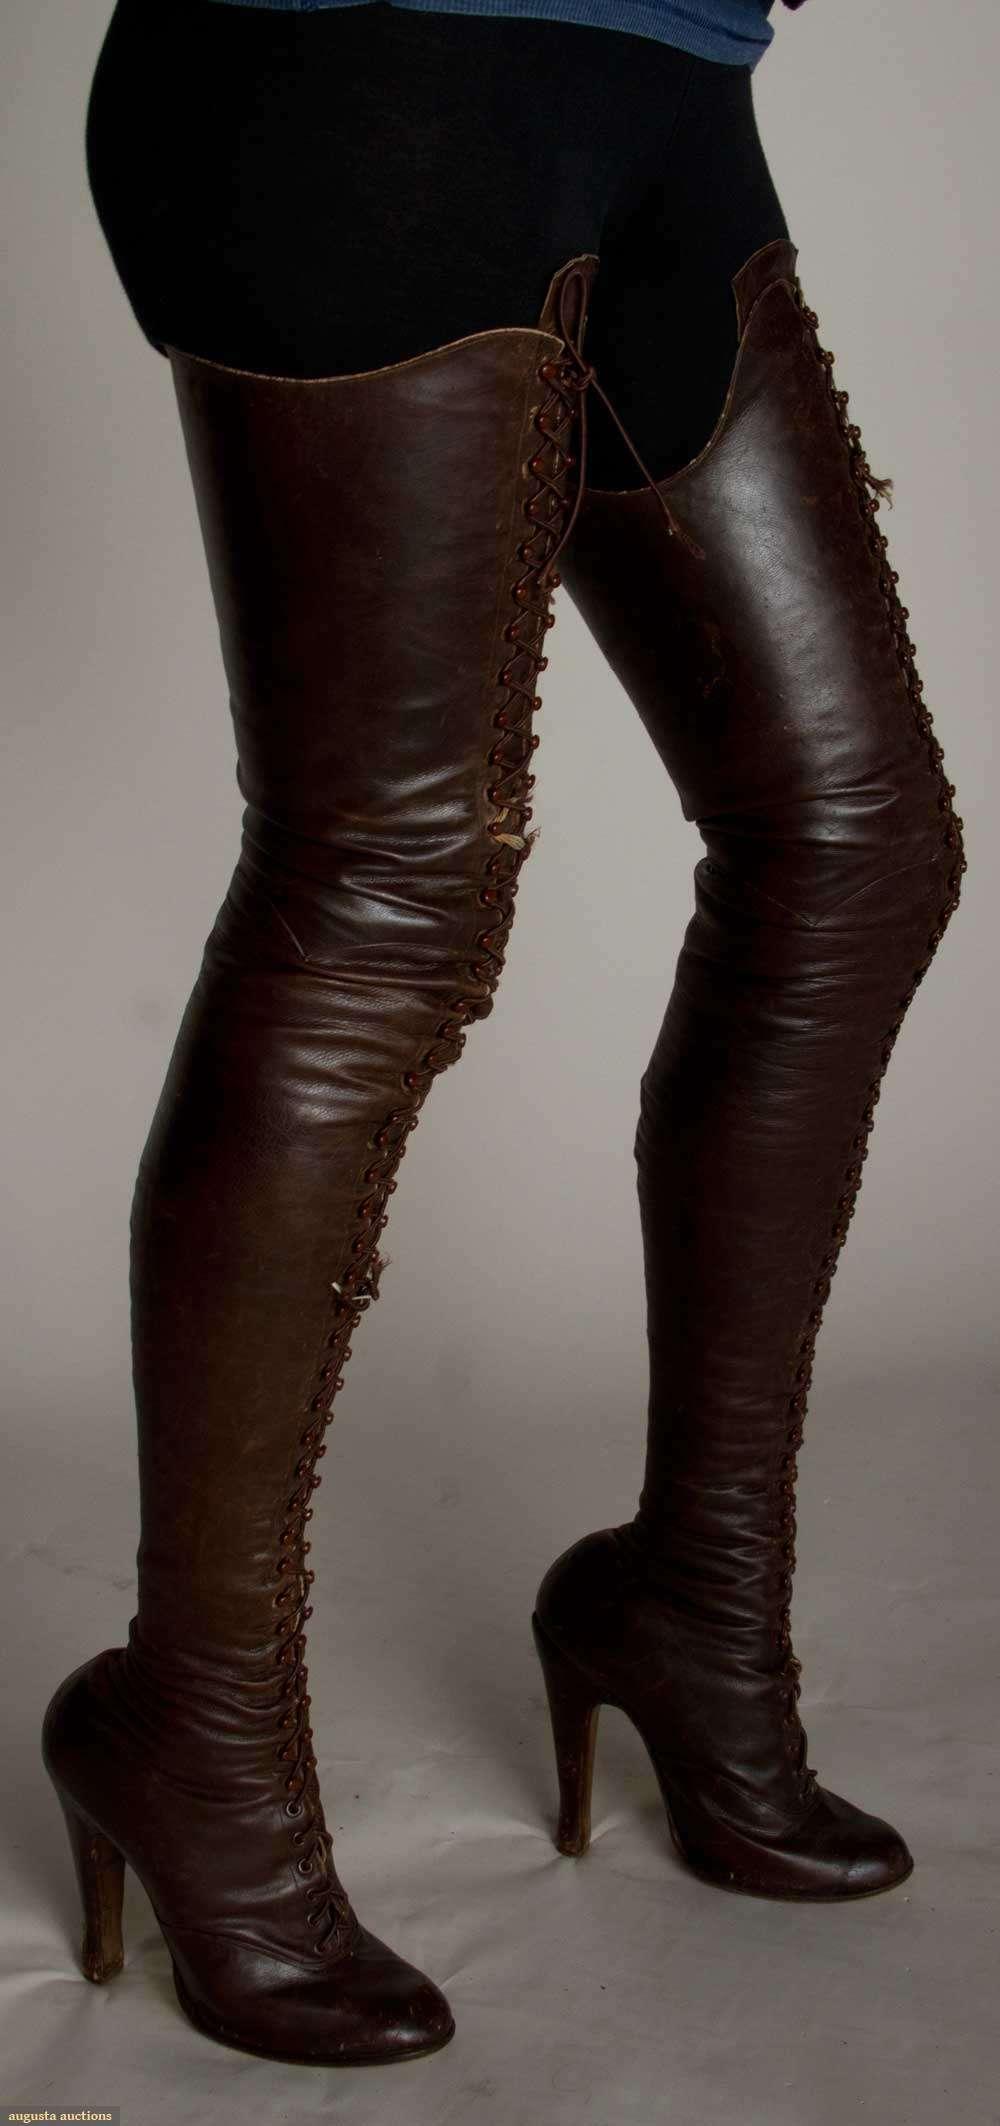 boot fetish